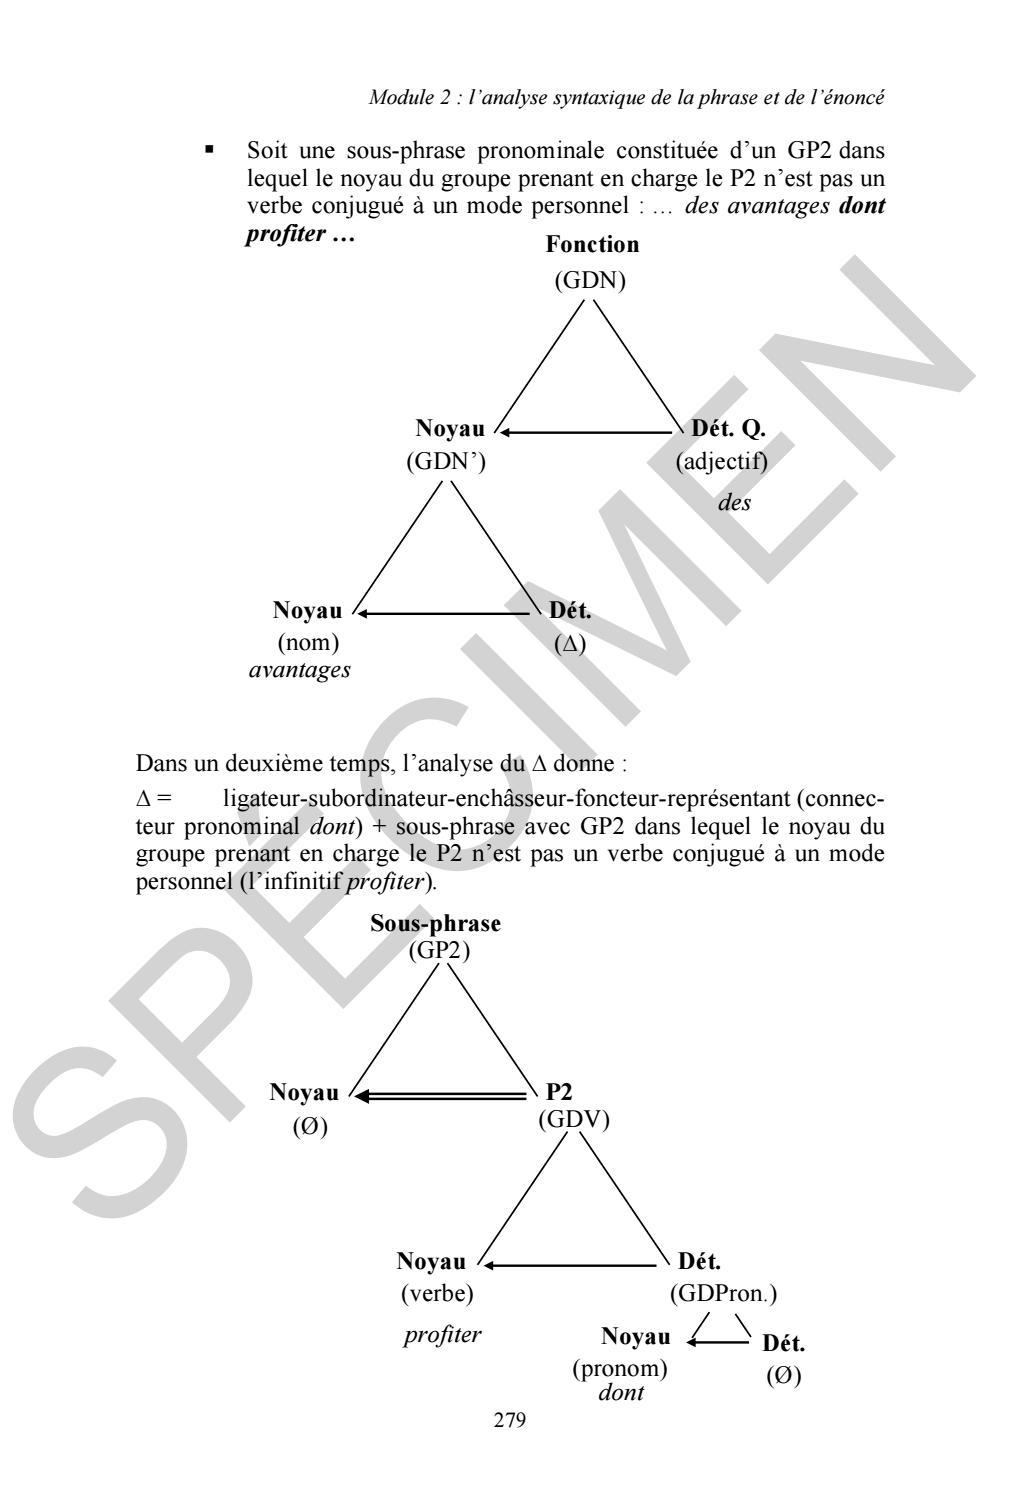 Le Sens Grammatical Referentiel A L Usage Des Enseignants By Lionel Meinertzhagen Issuu